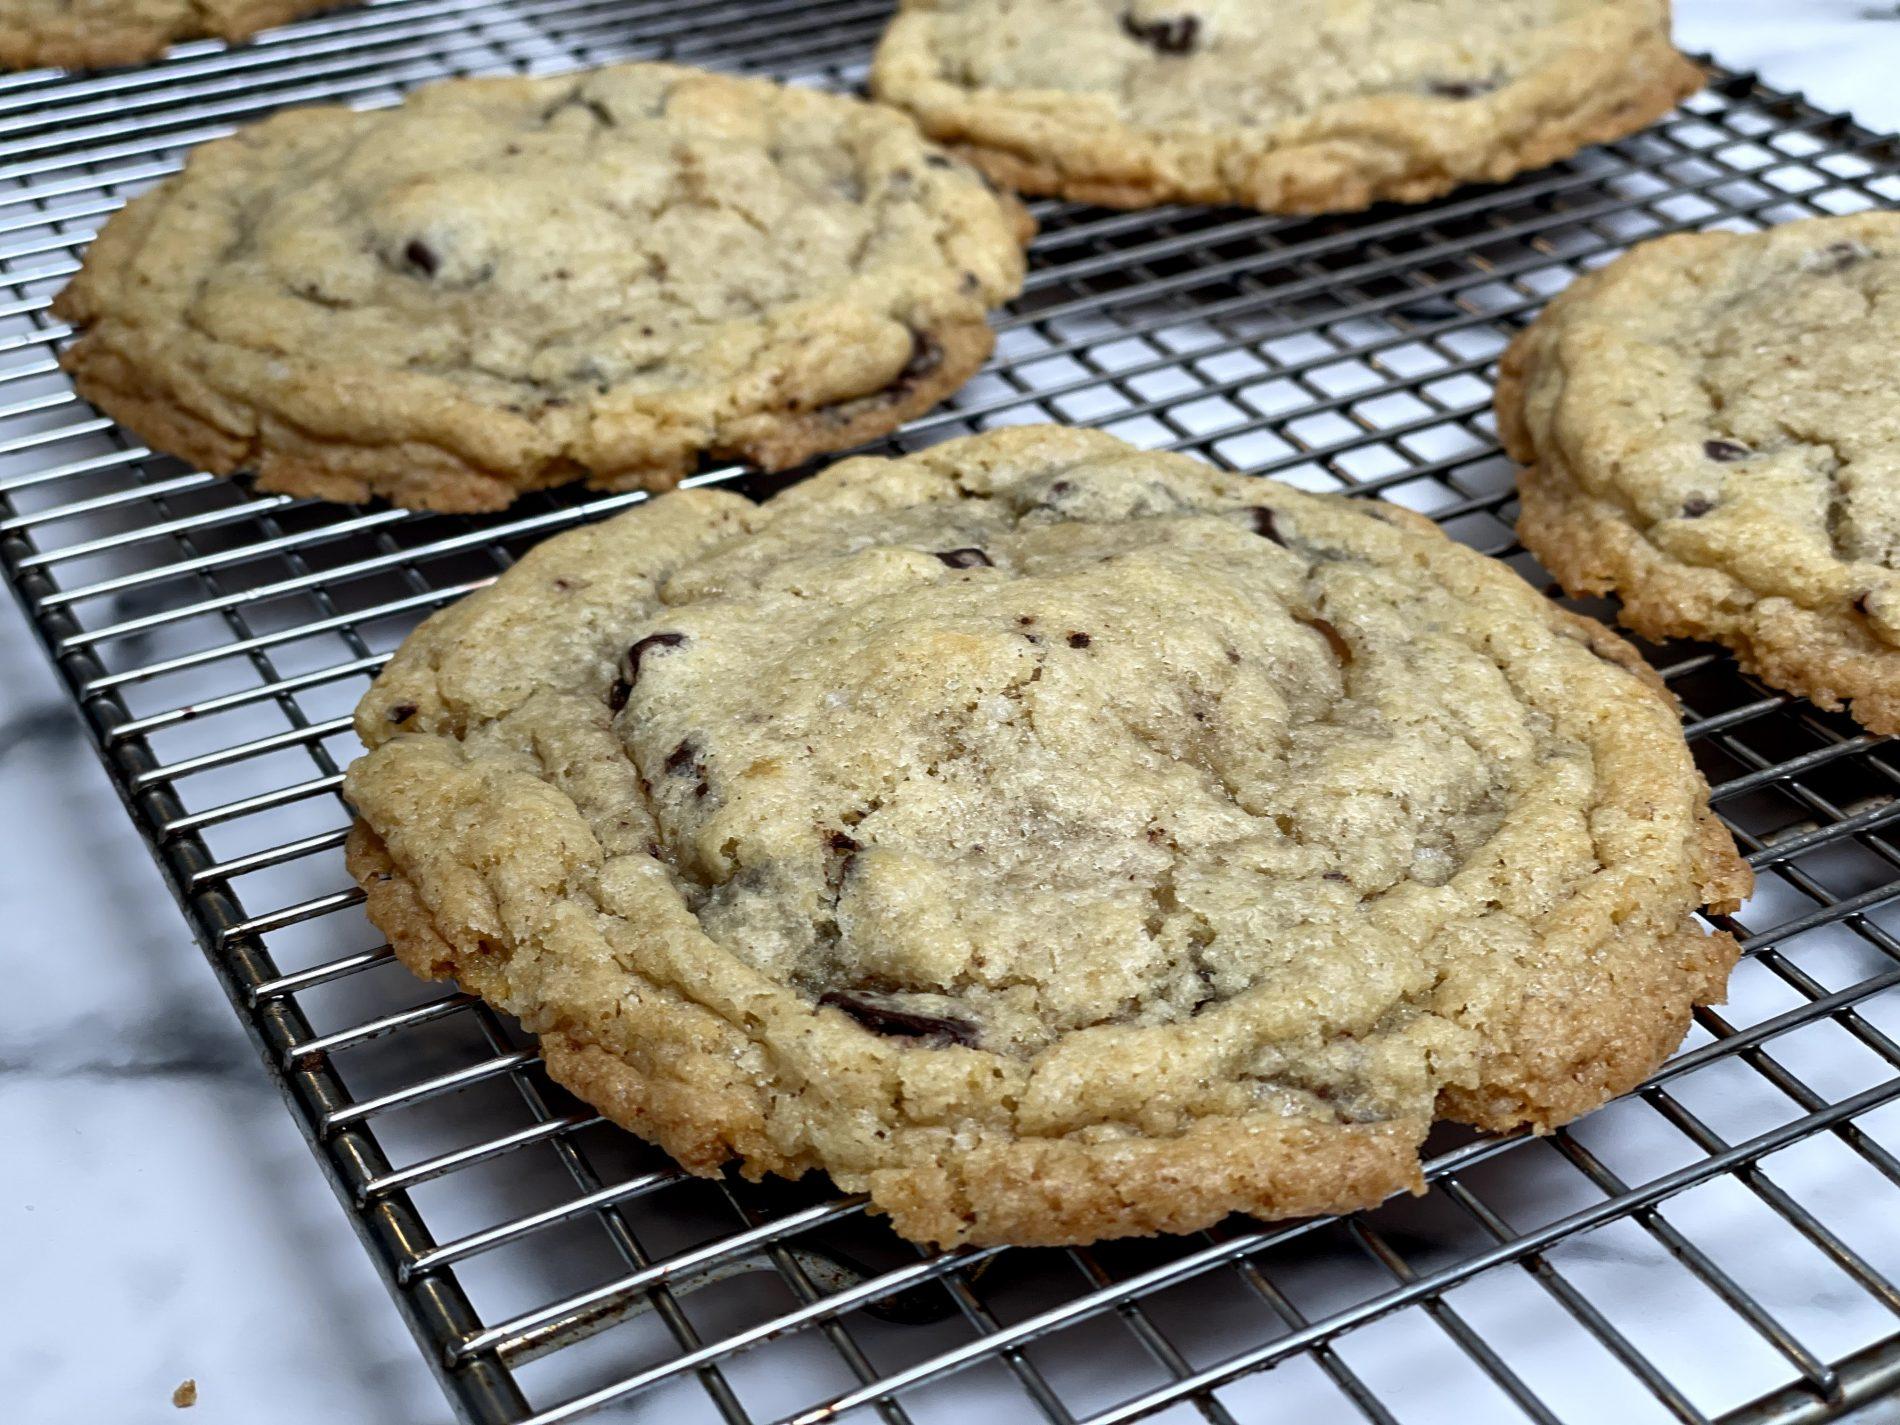 edmonton yeg salted caramel chocolate cookie